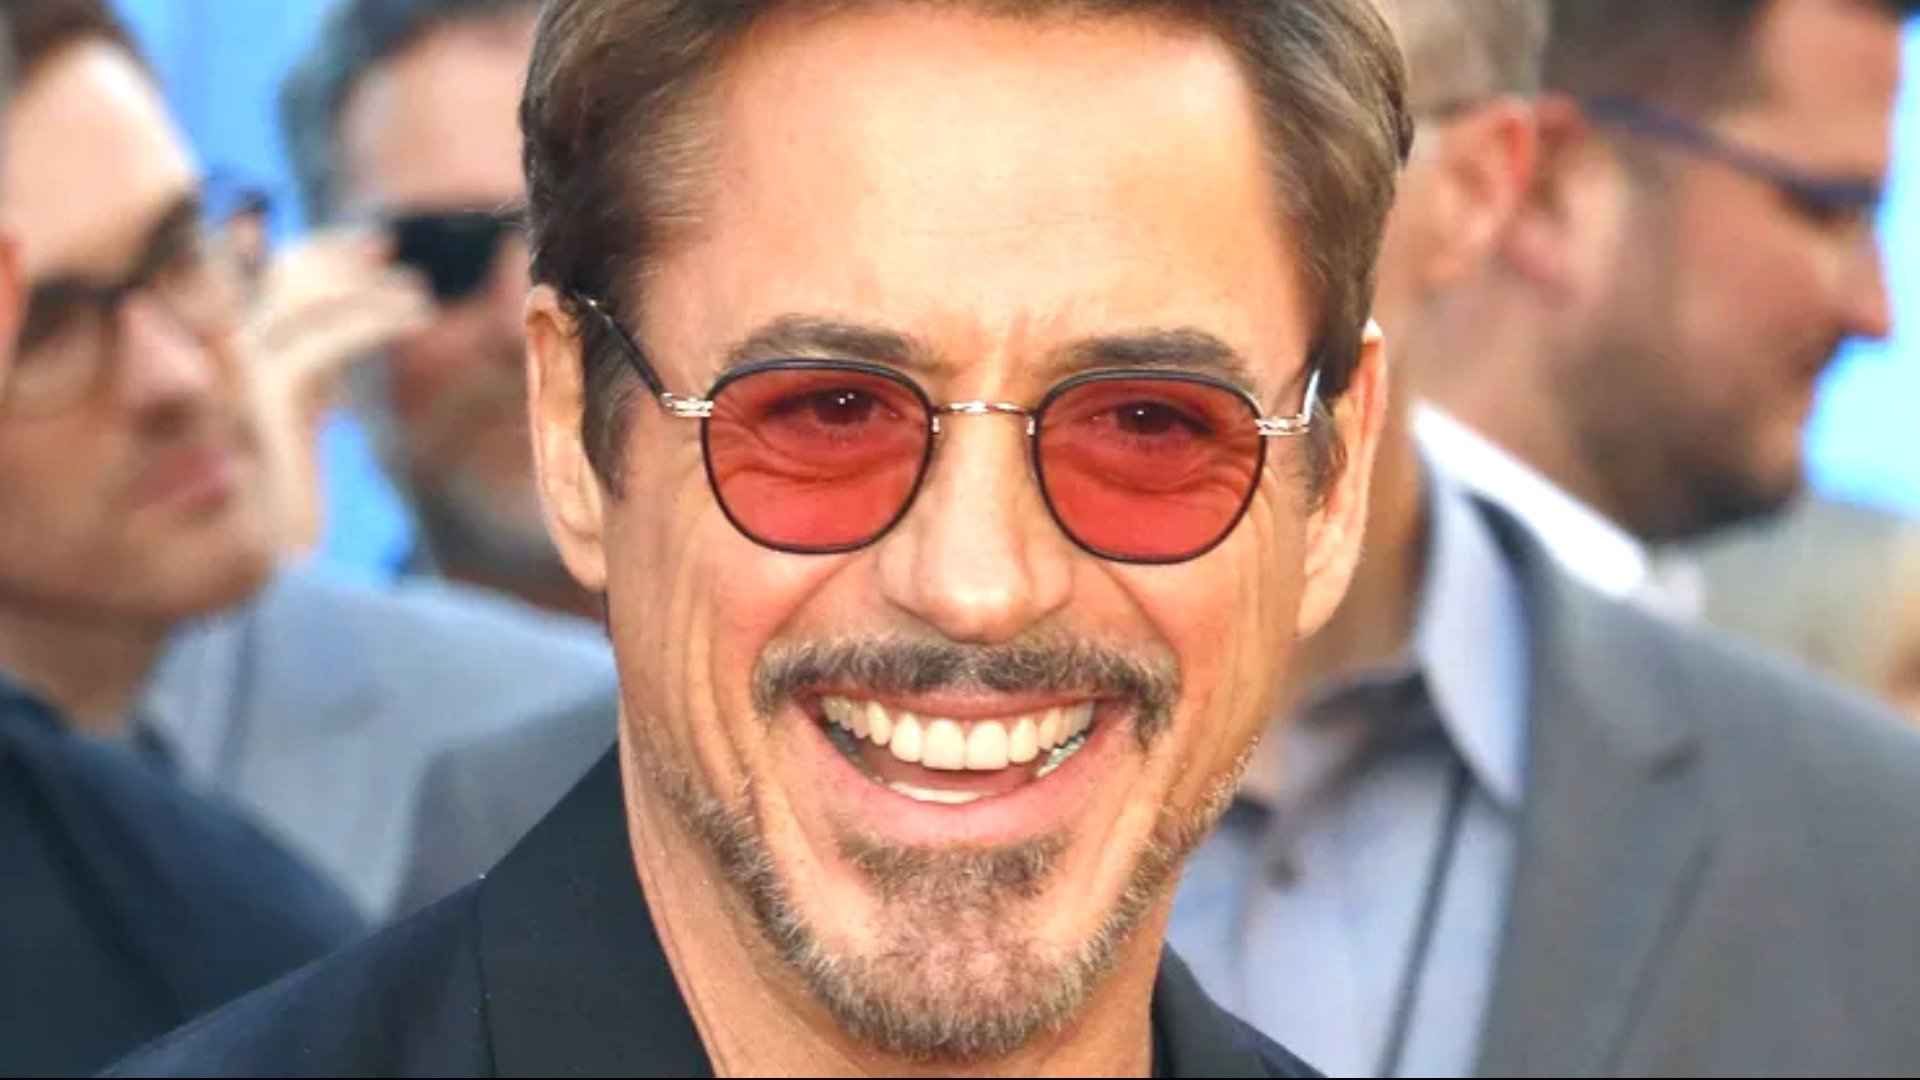 The Surprising Movie Robert Downey Jr. Calls His Best Film